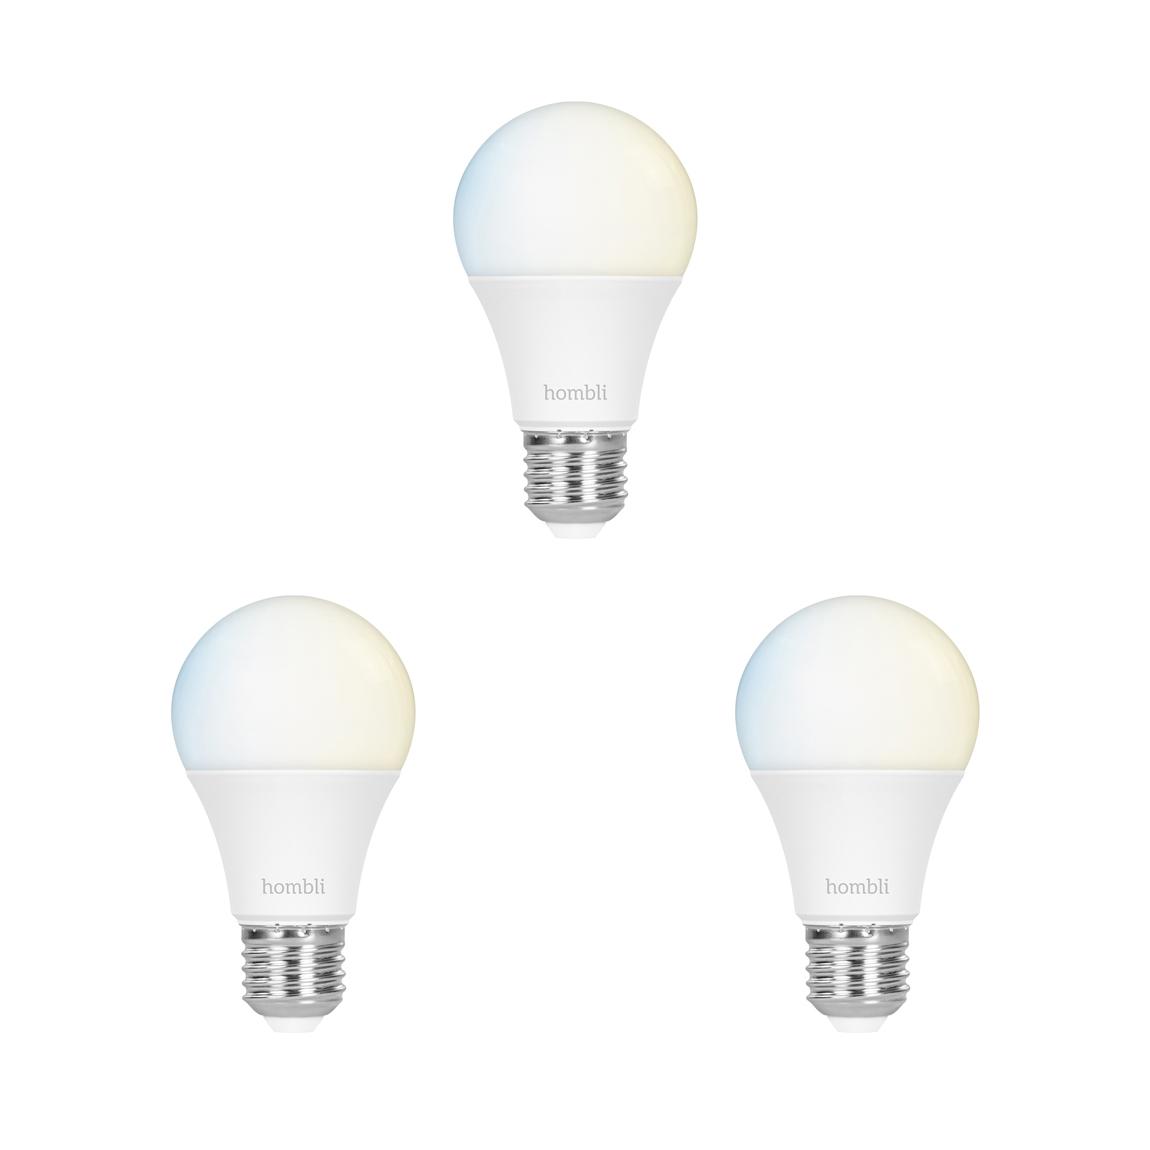 Hombli Smart Bulb E27 White-Lampe 3er-Set